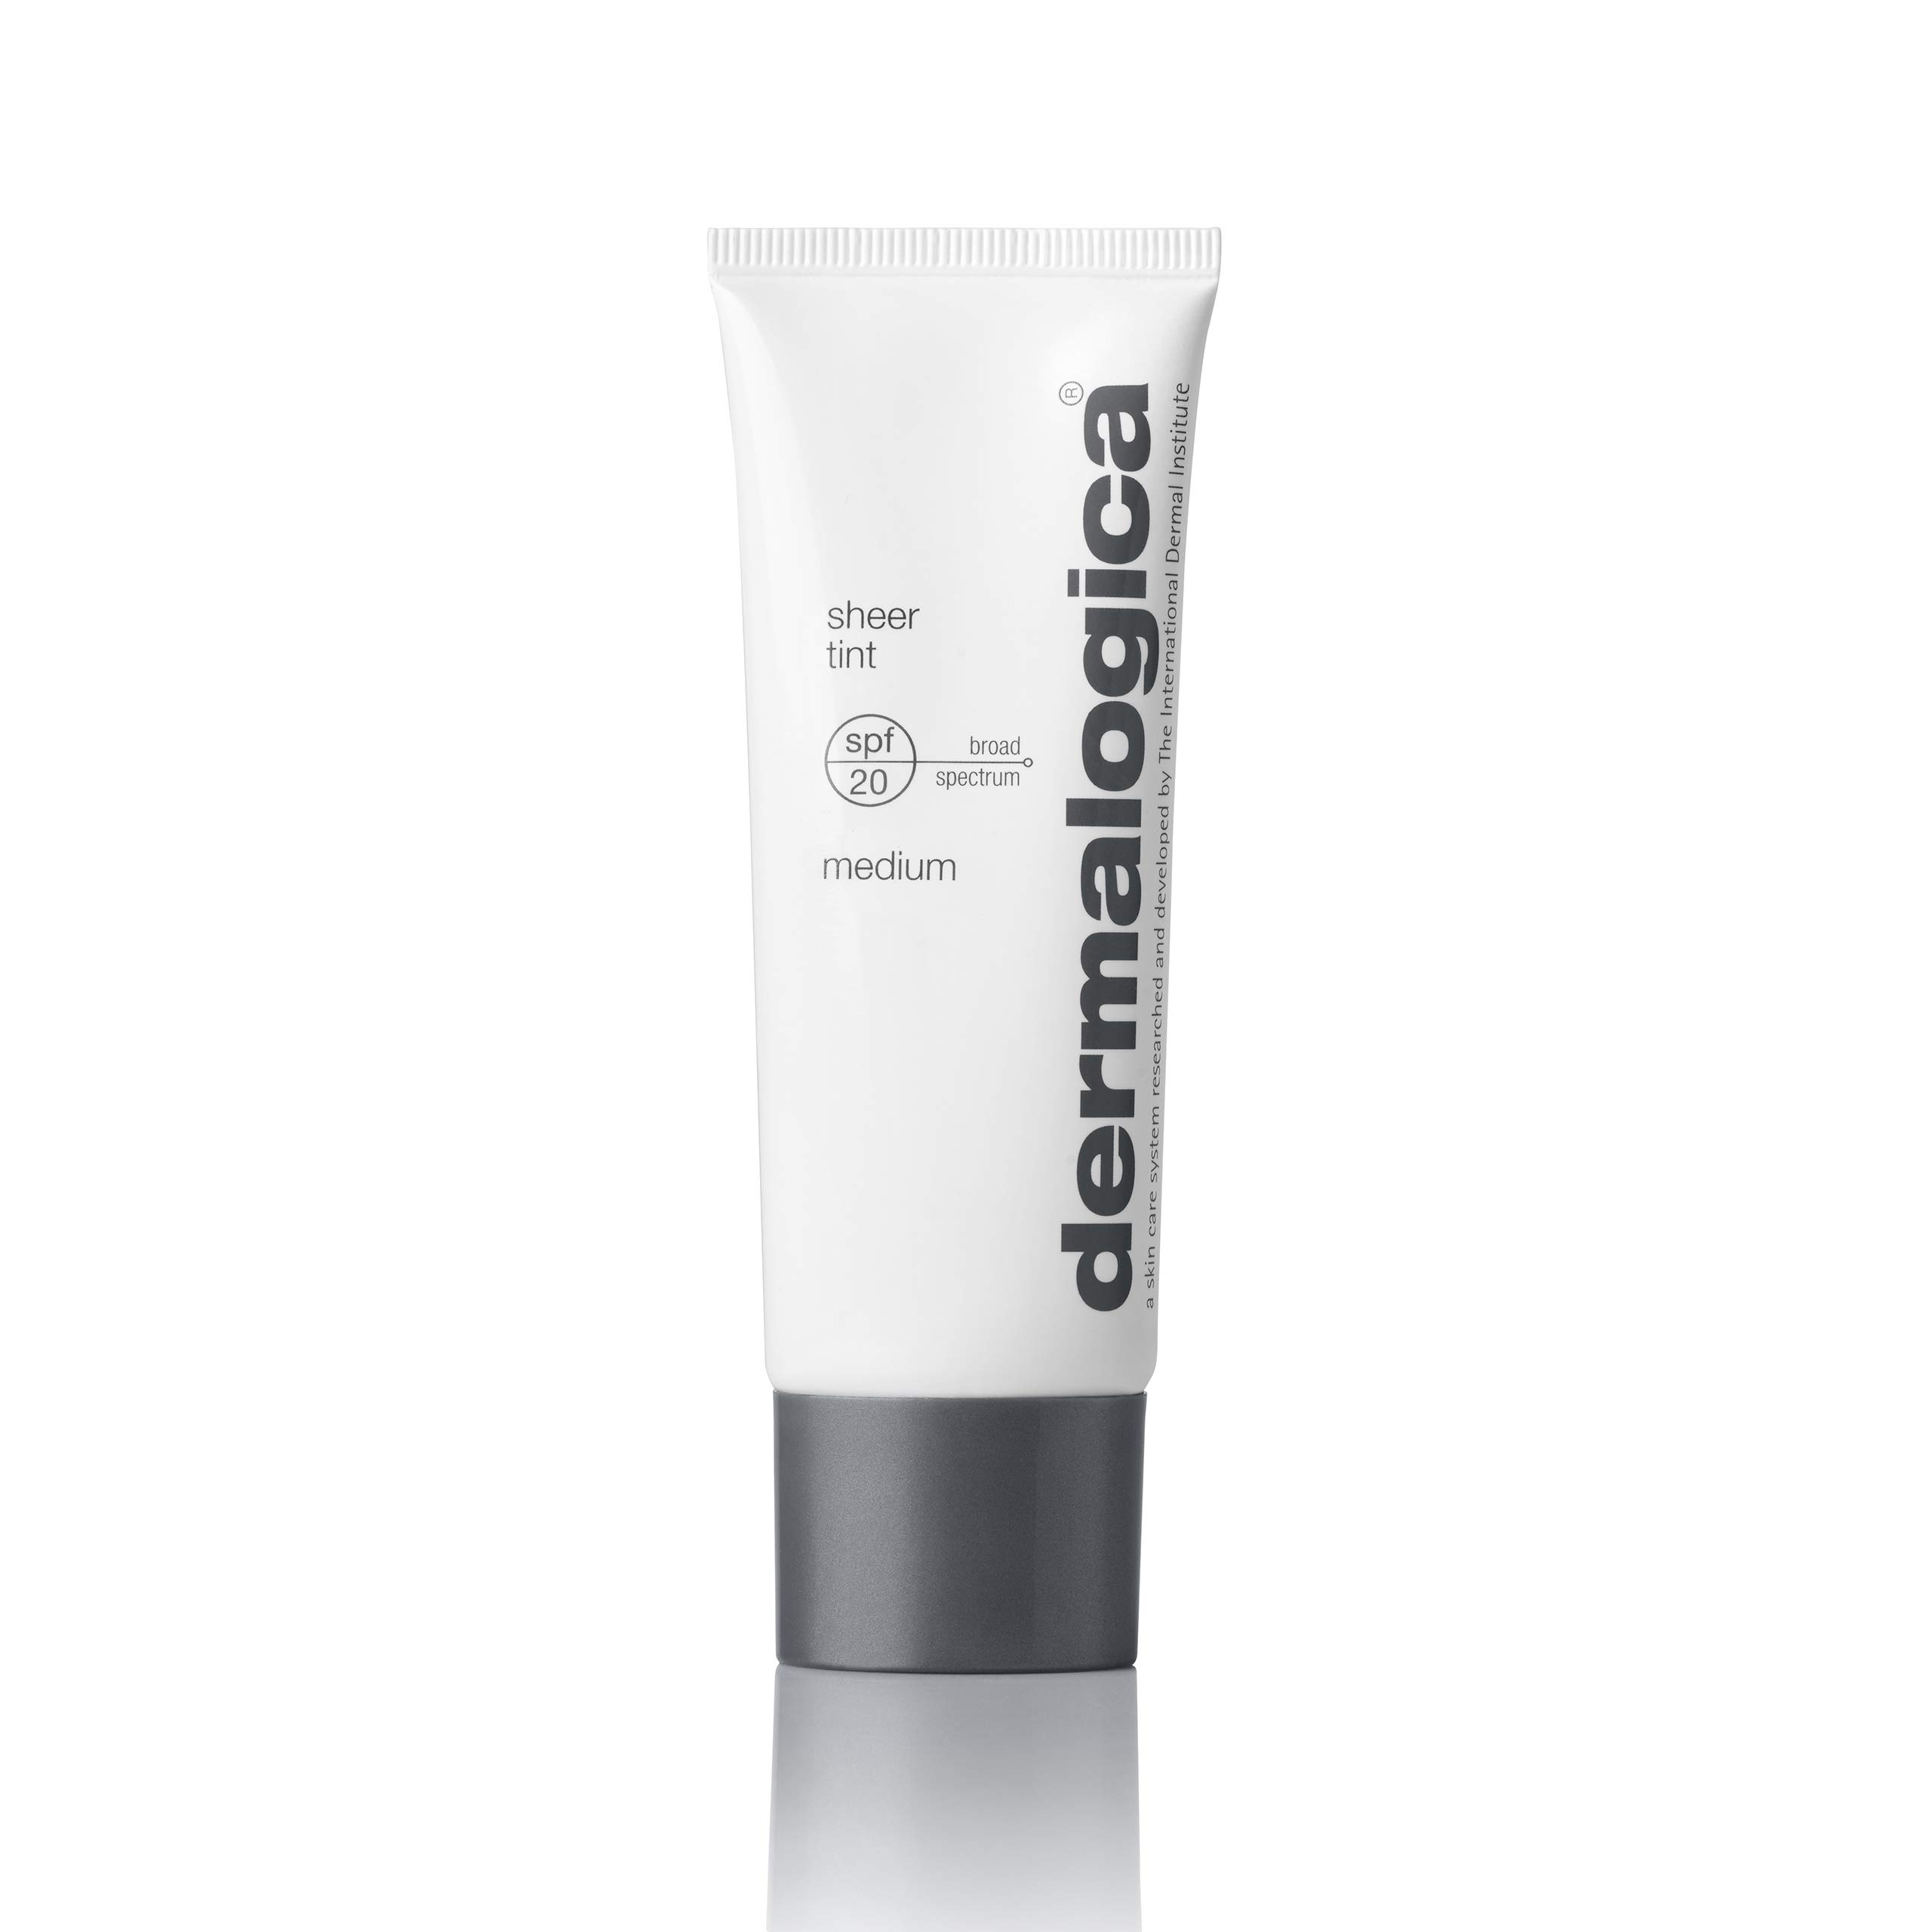 Dermalogica Sheer Tint Sunscreen Lotion SPF 20, Medium, 1.3 Fl Oz